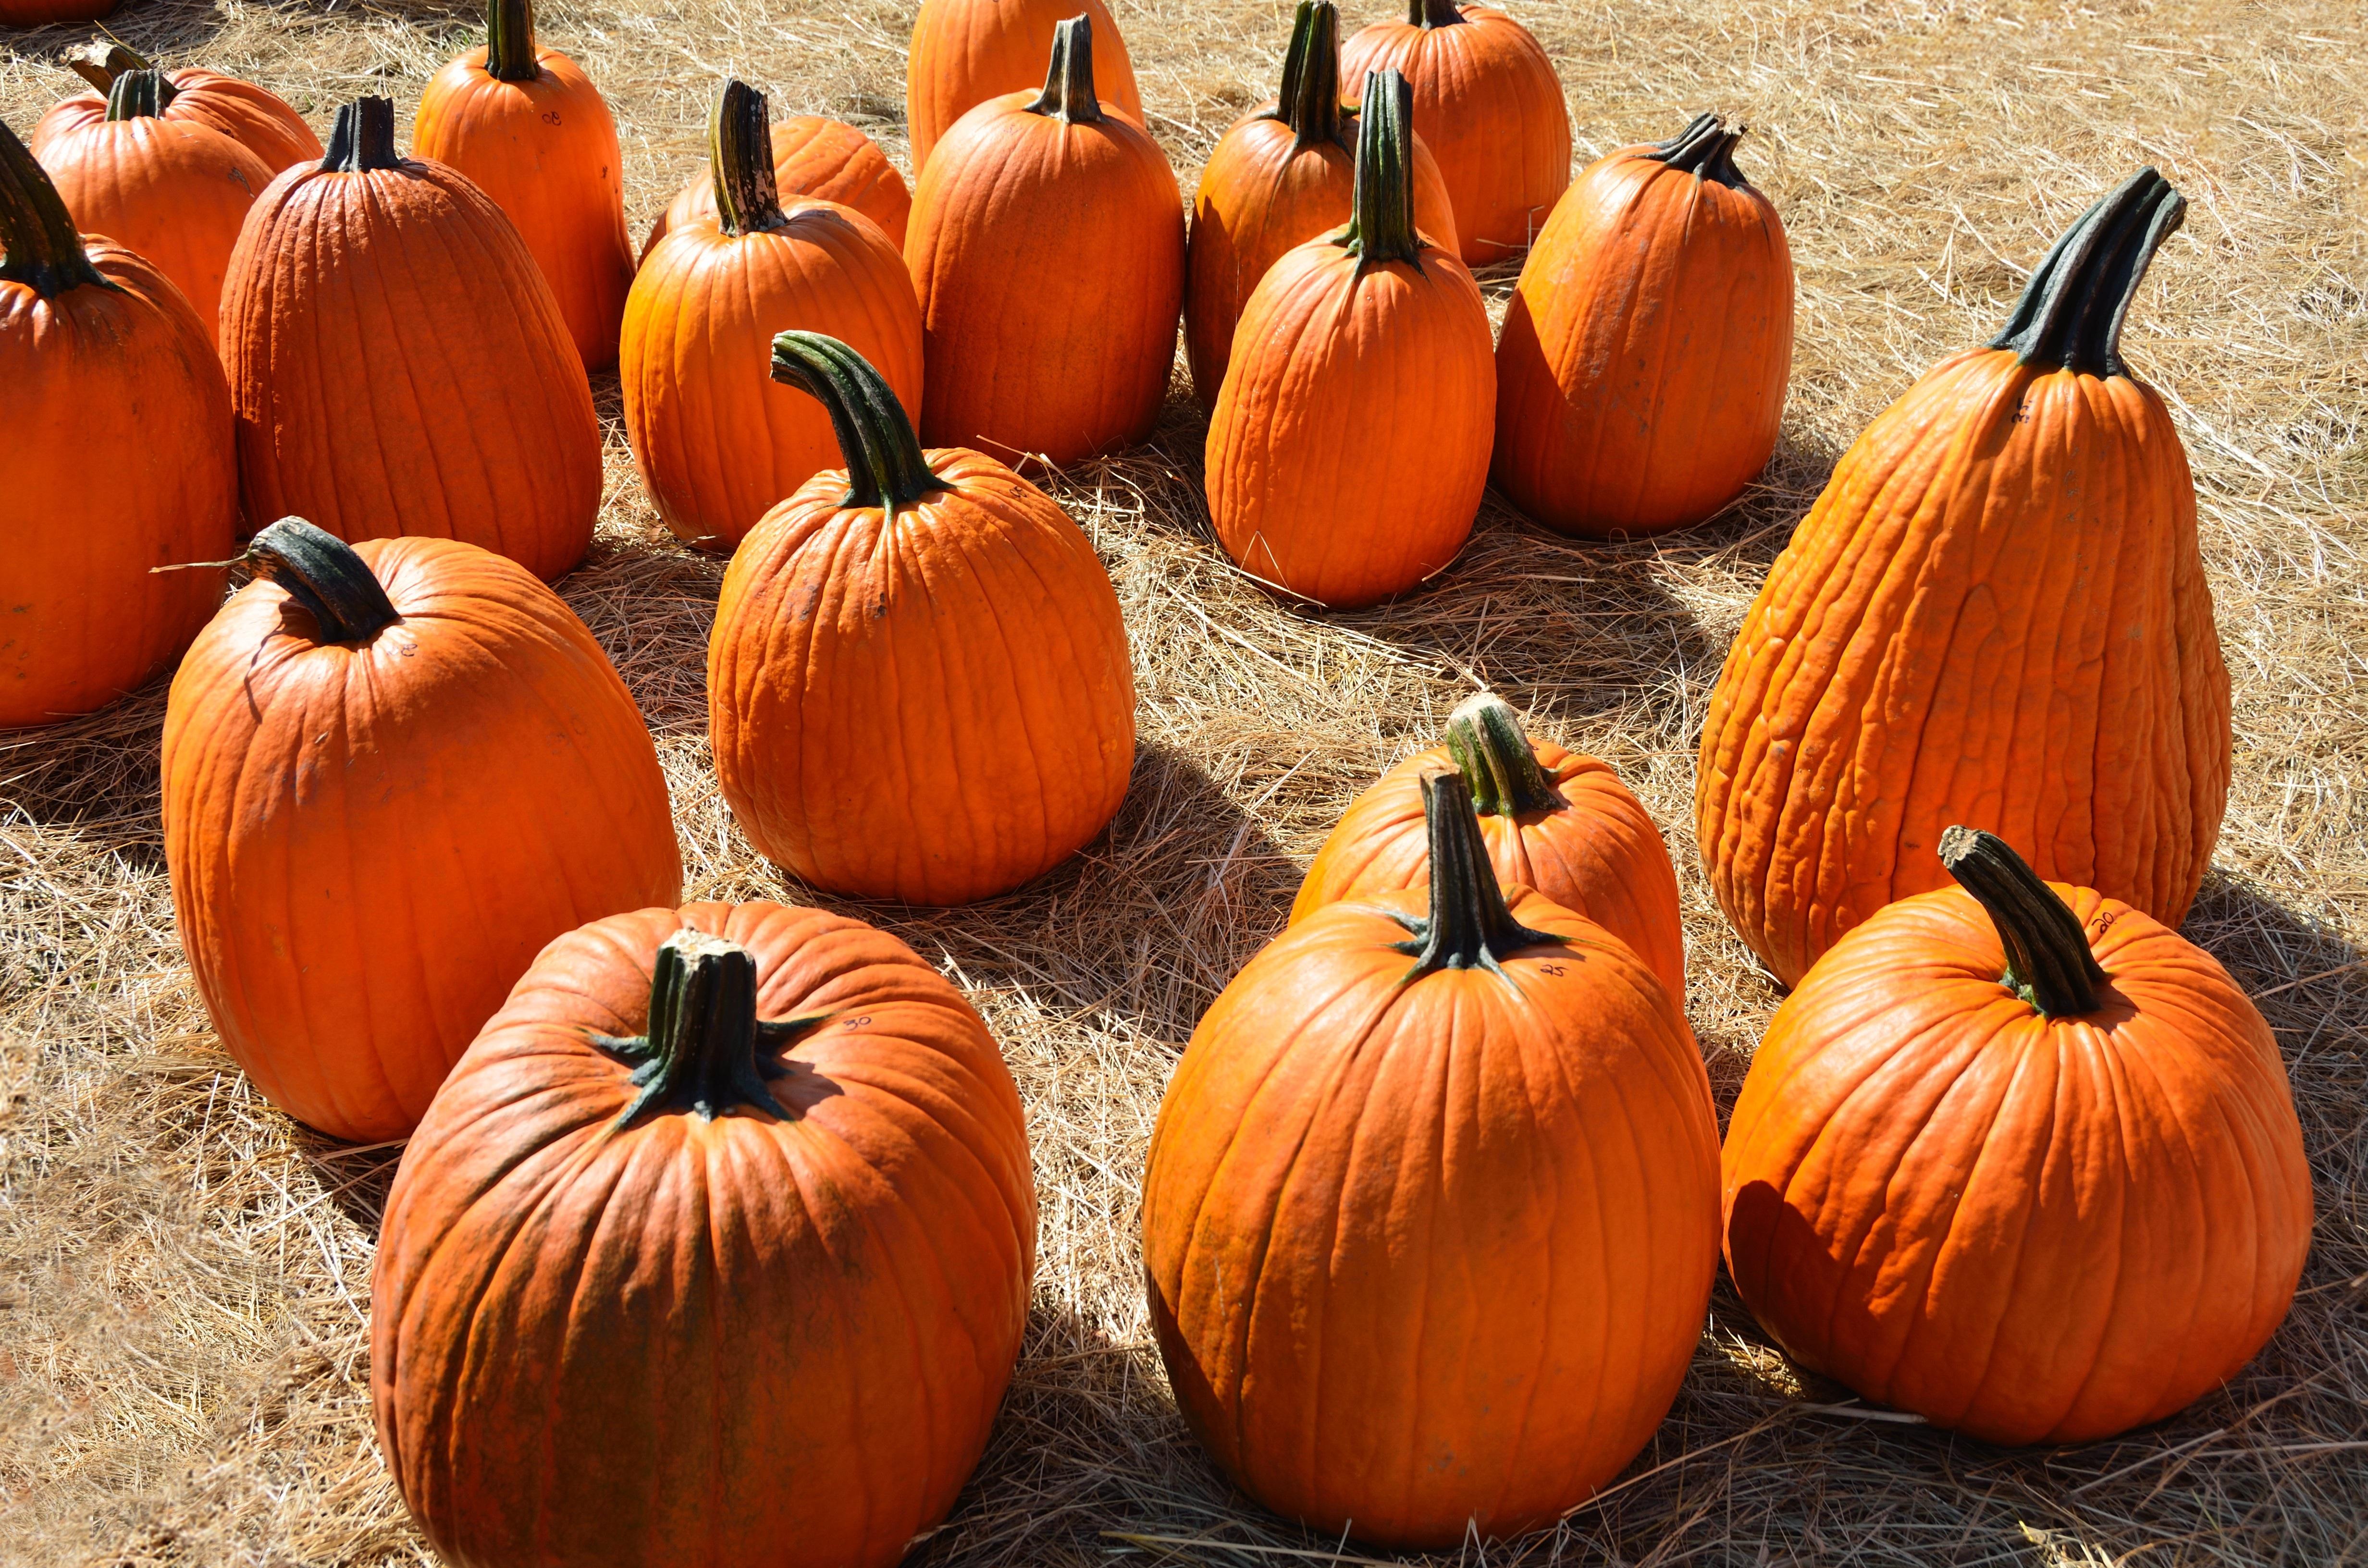 free images fall spooky celebration orange harvest produce